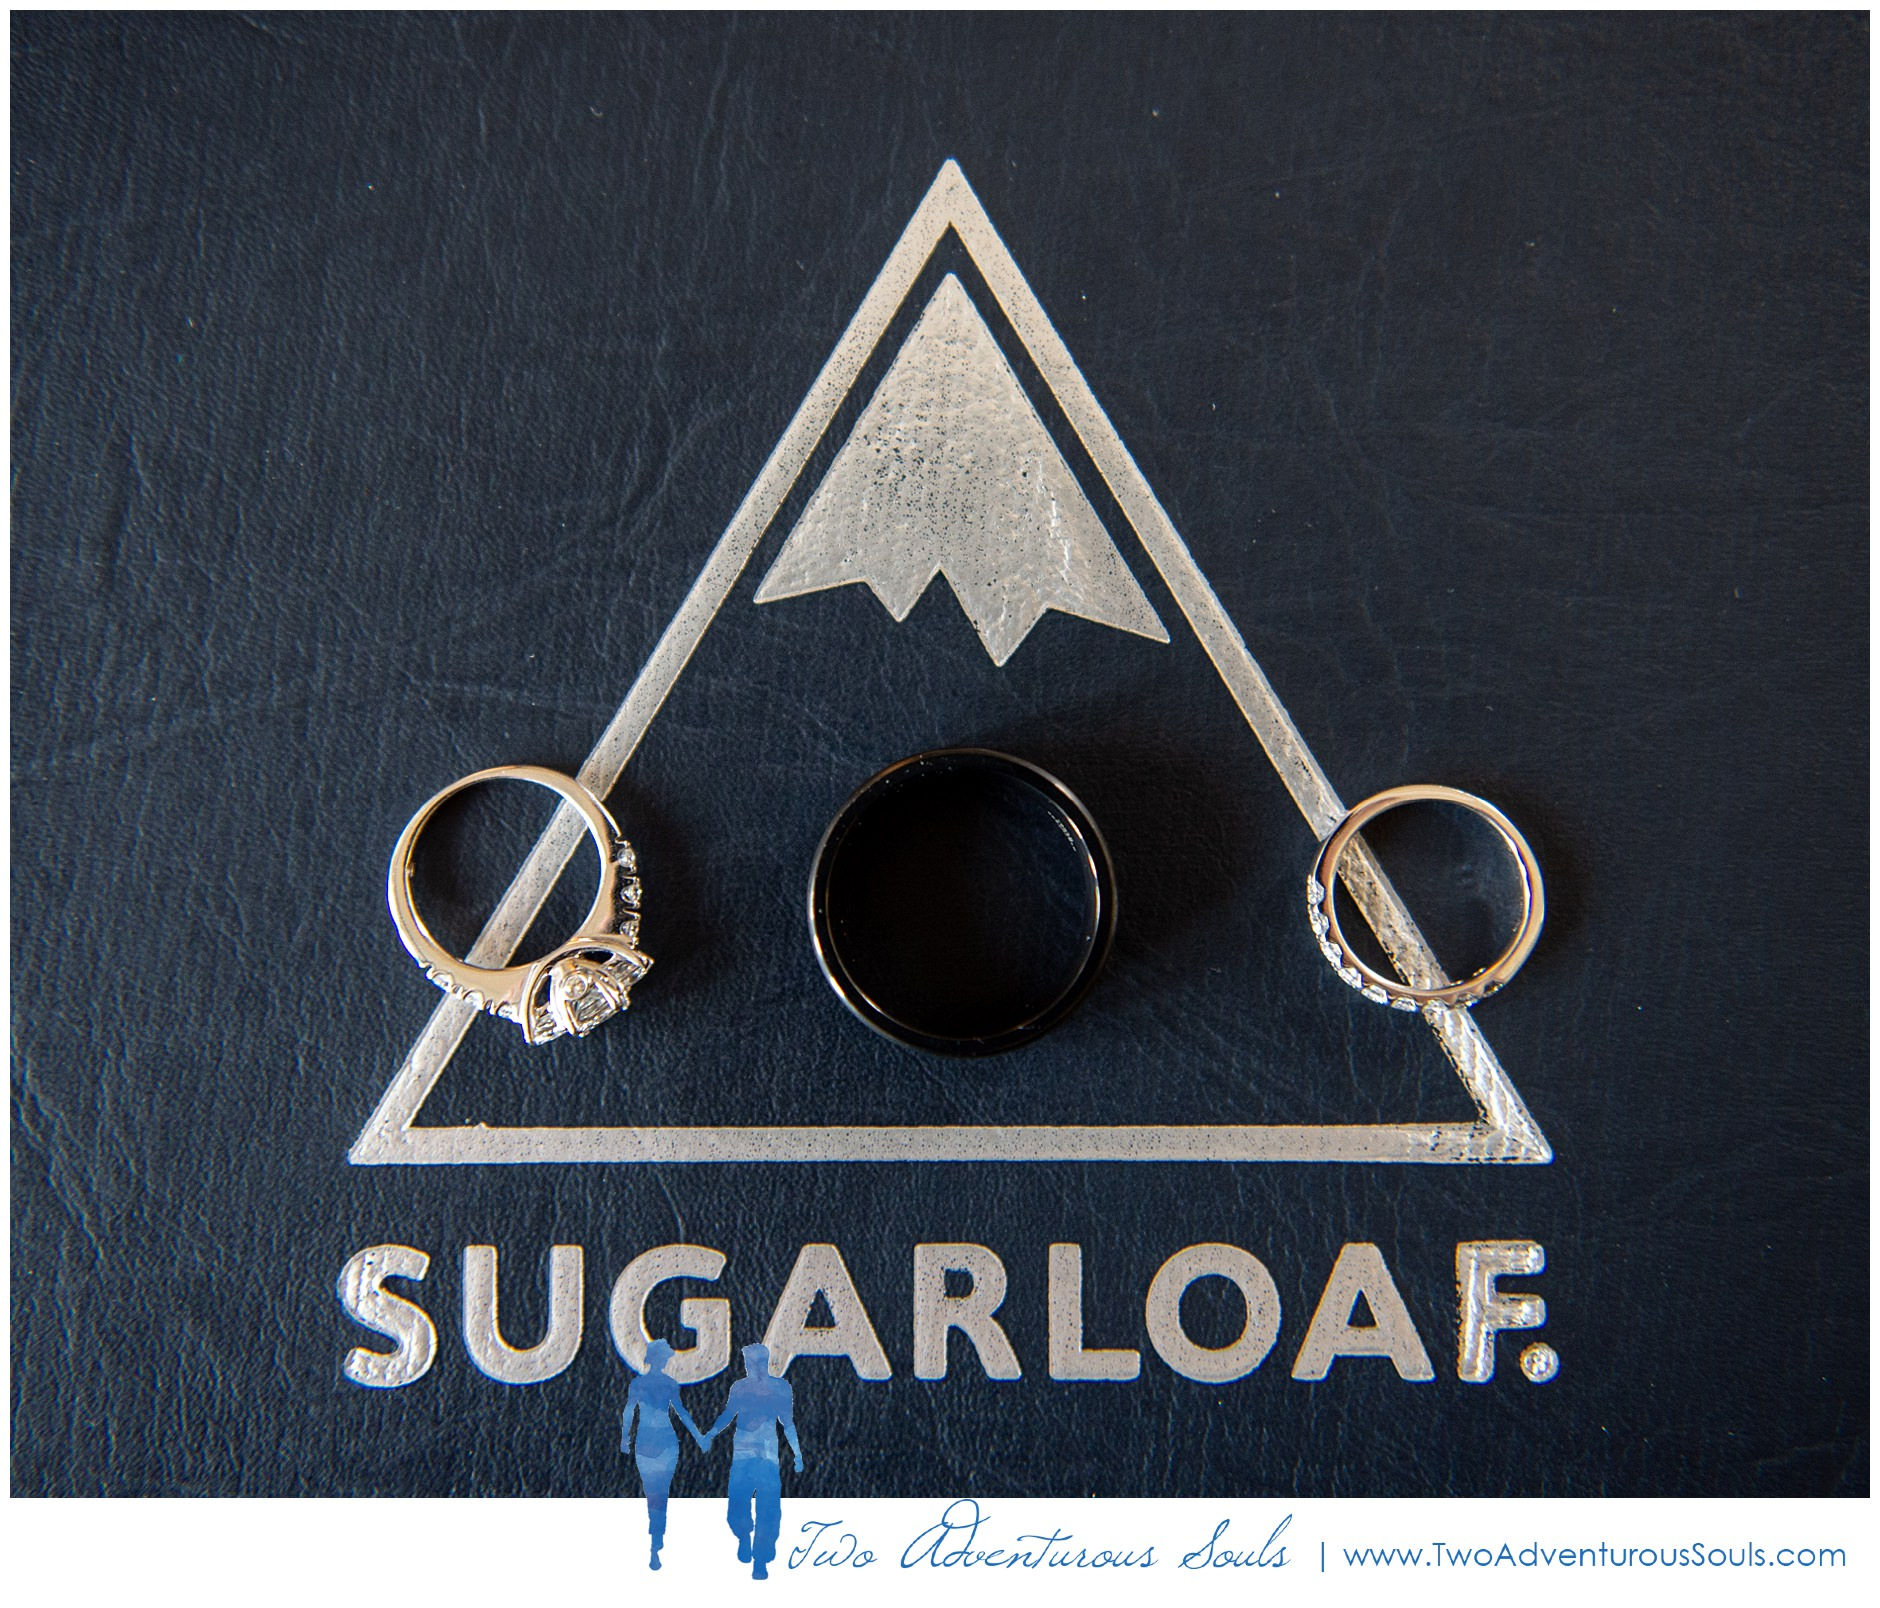 Sugarloaf Outdoor Center Wedding Photographers, Destination Wedding Photographers, Two Adventurous Souls-081719_0003.jpg